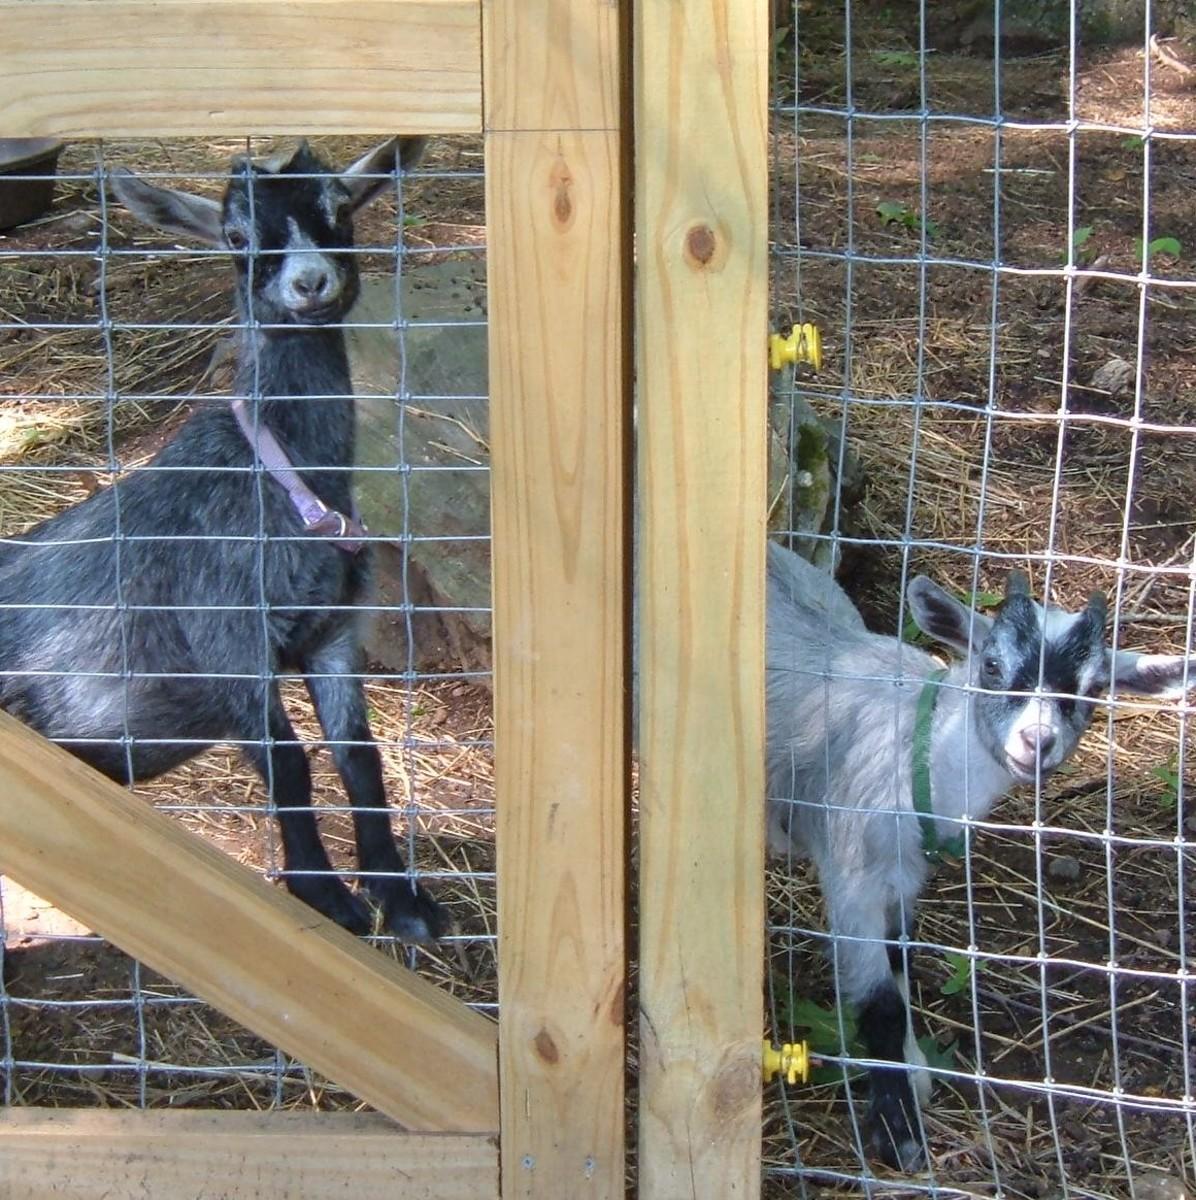 Our pet pygmy goats, Oliver & Delilha